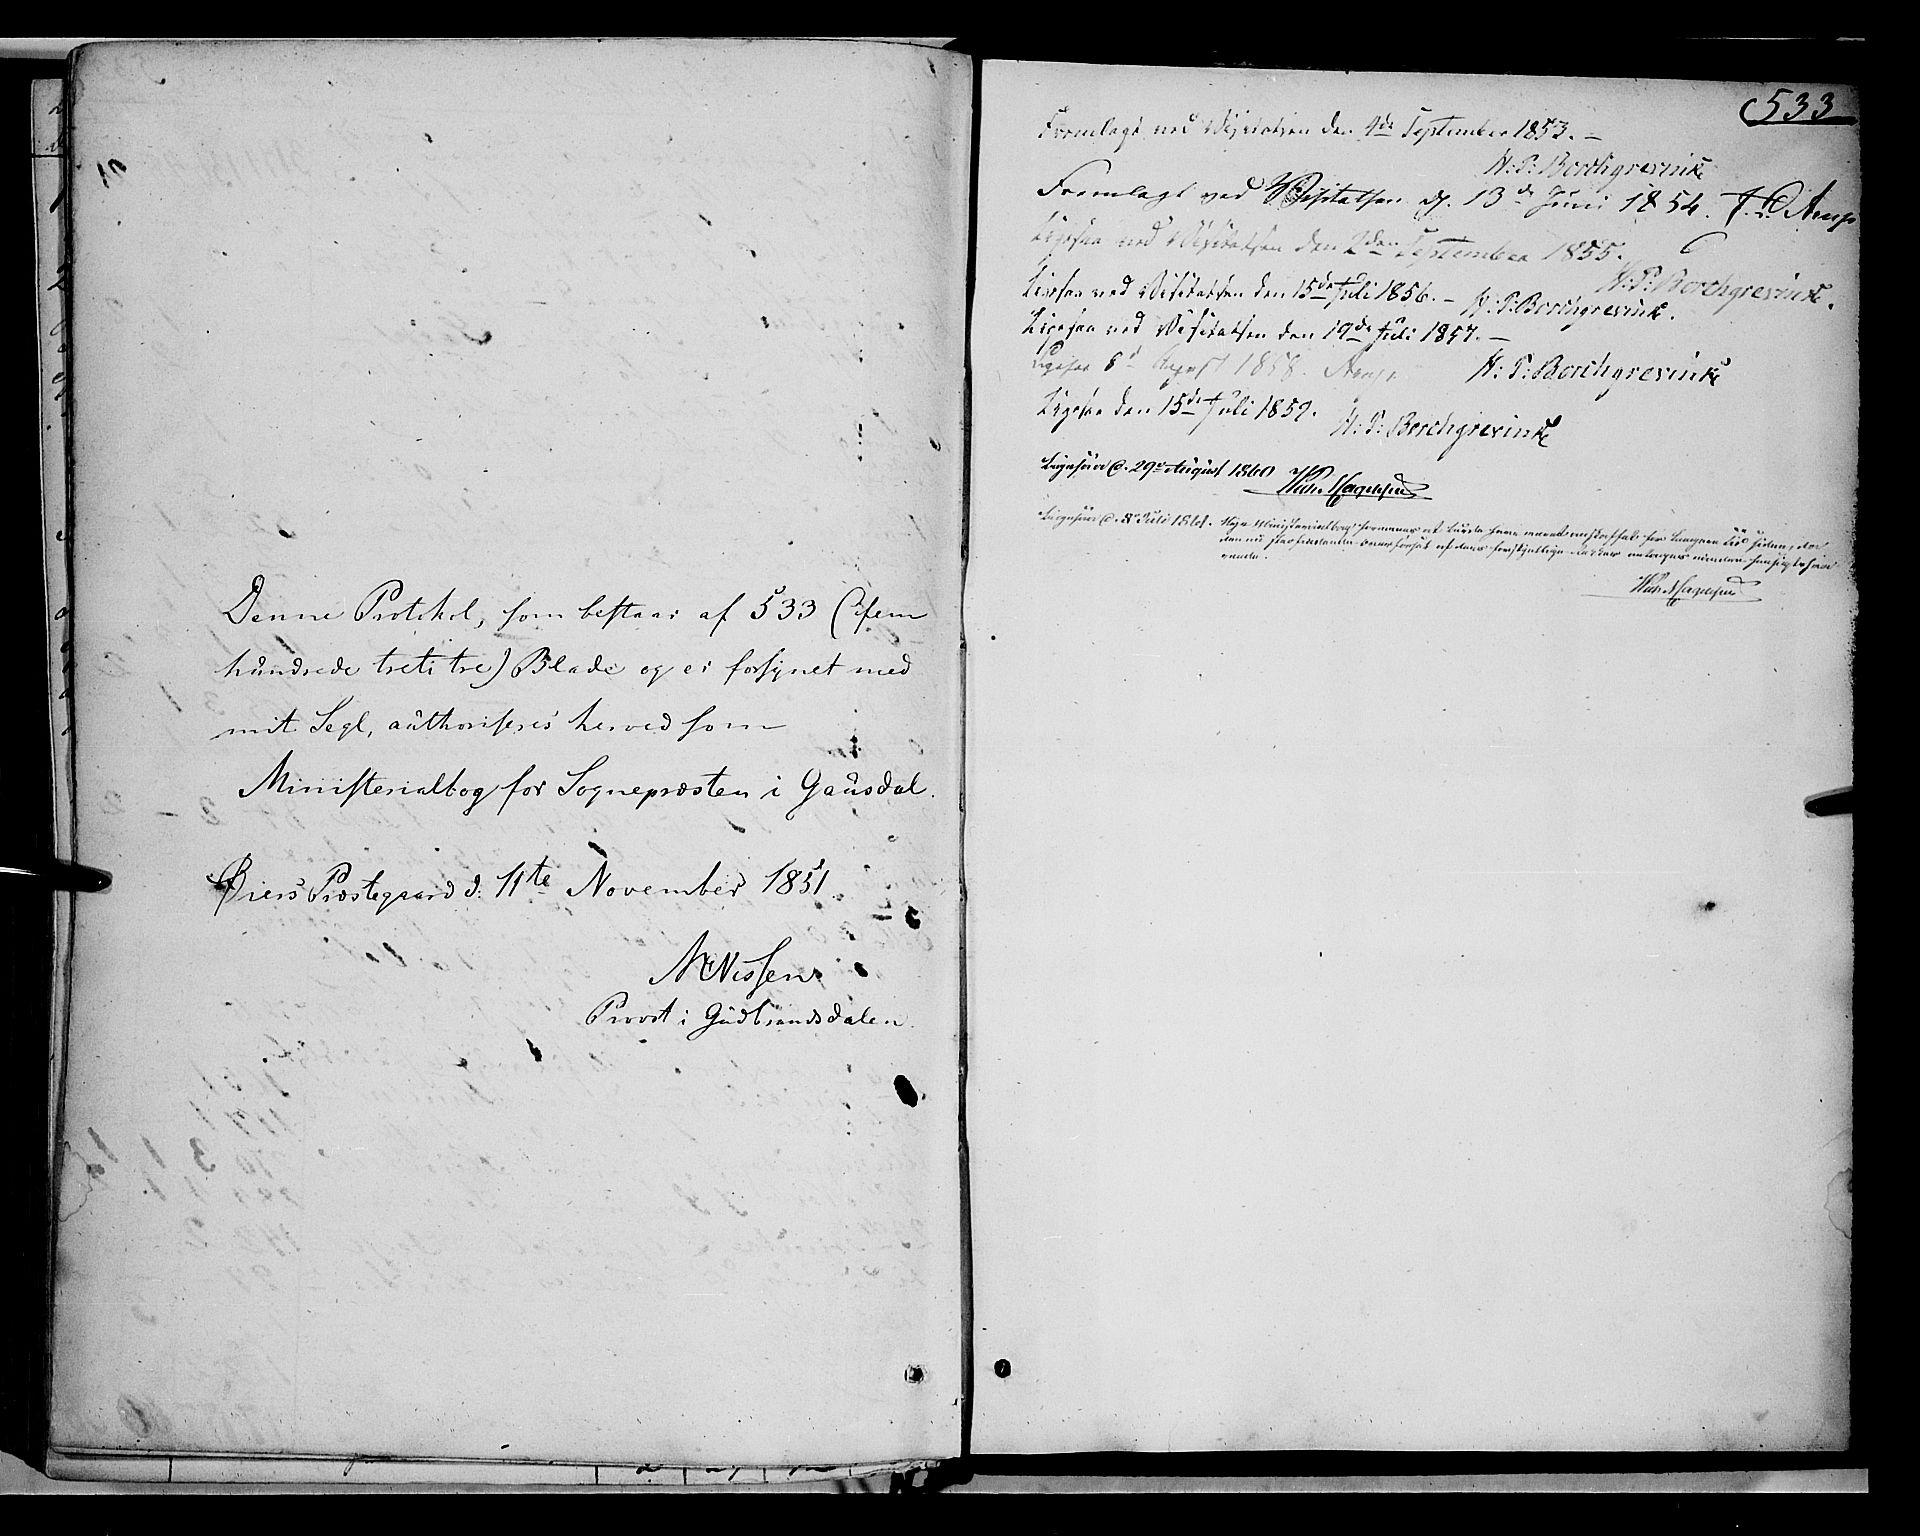 SAH, Gausdal prestekontor, Ministerialbok nr. 8, 1850-1861, s. 533